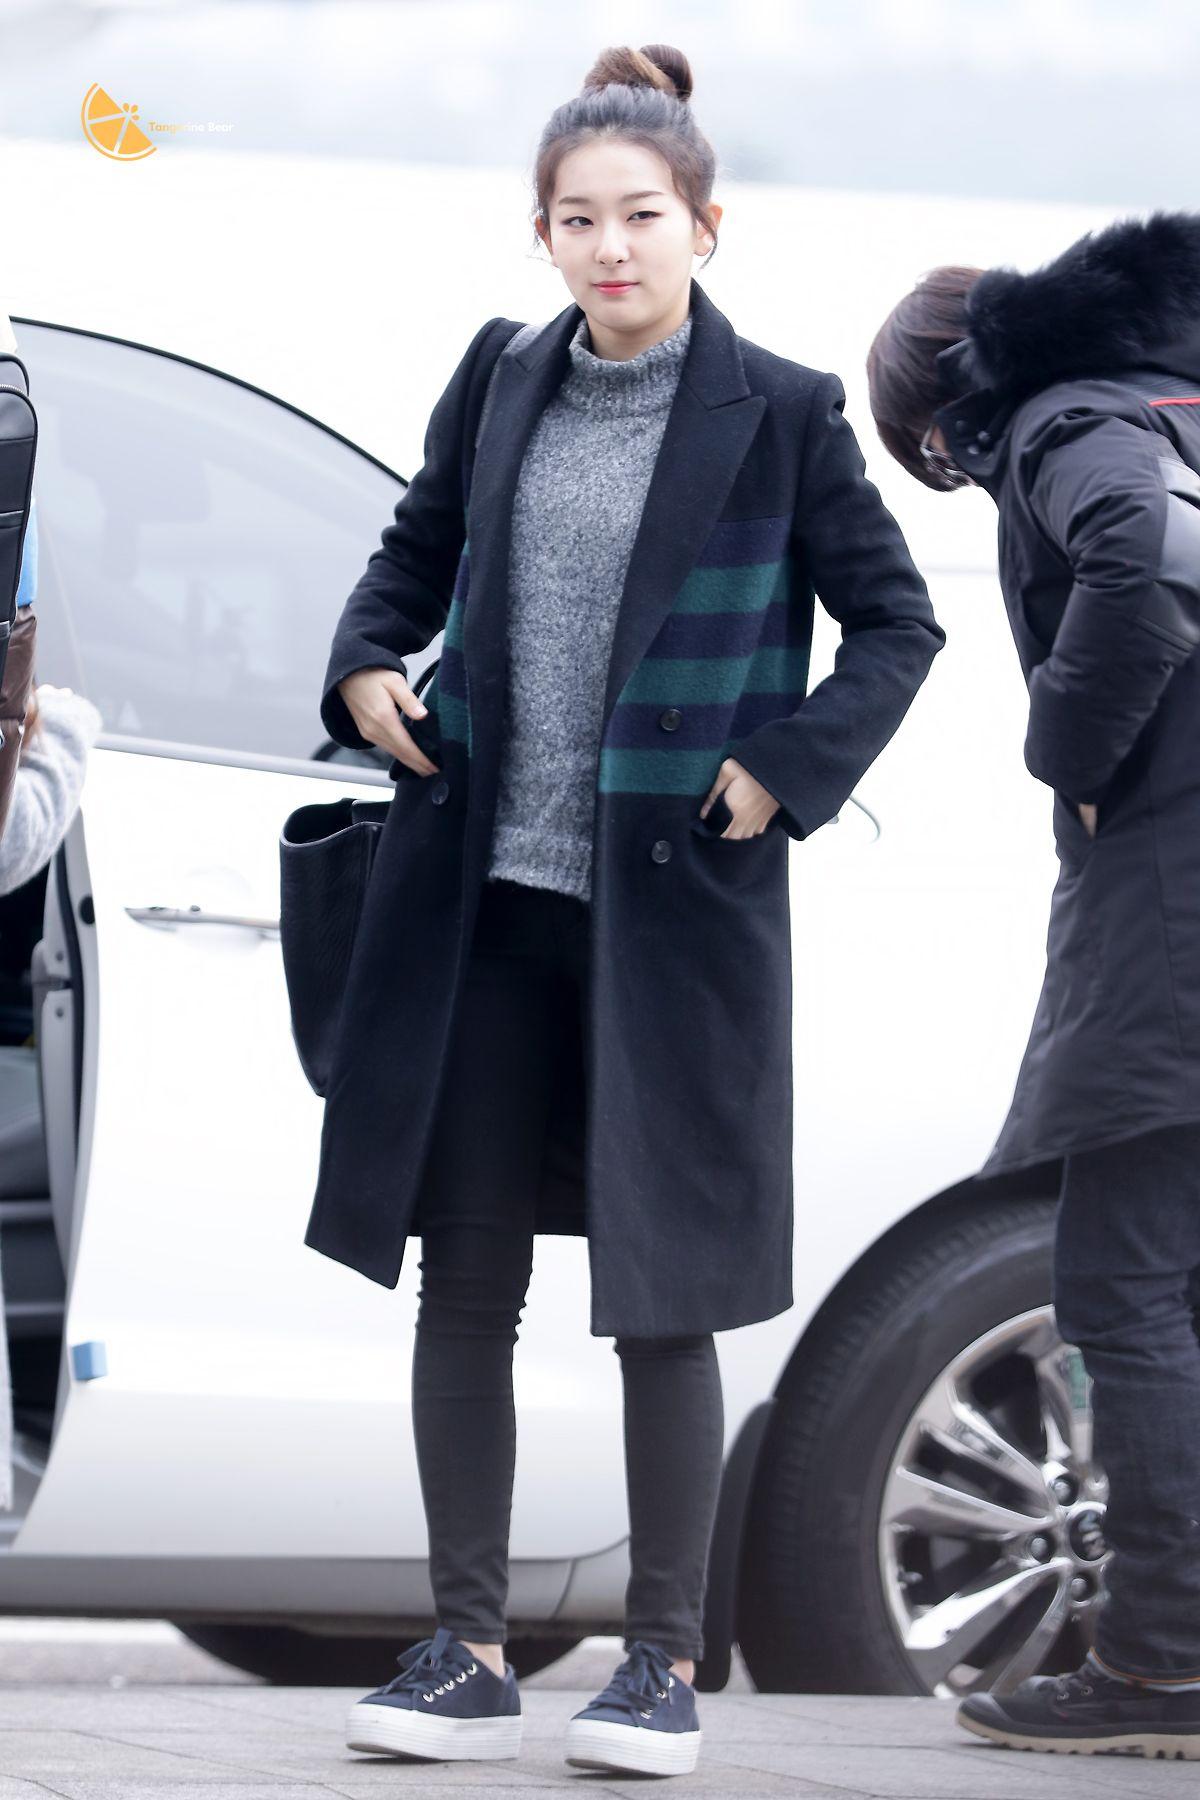 Red Velvet Seulgi Airport Fashion 150114 2015 Kpop Wanita Gadis Ulzzang Hitam